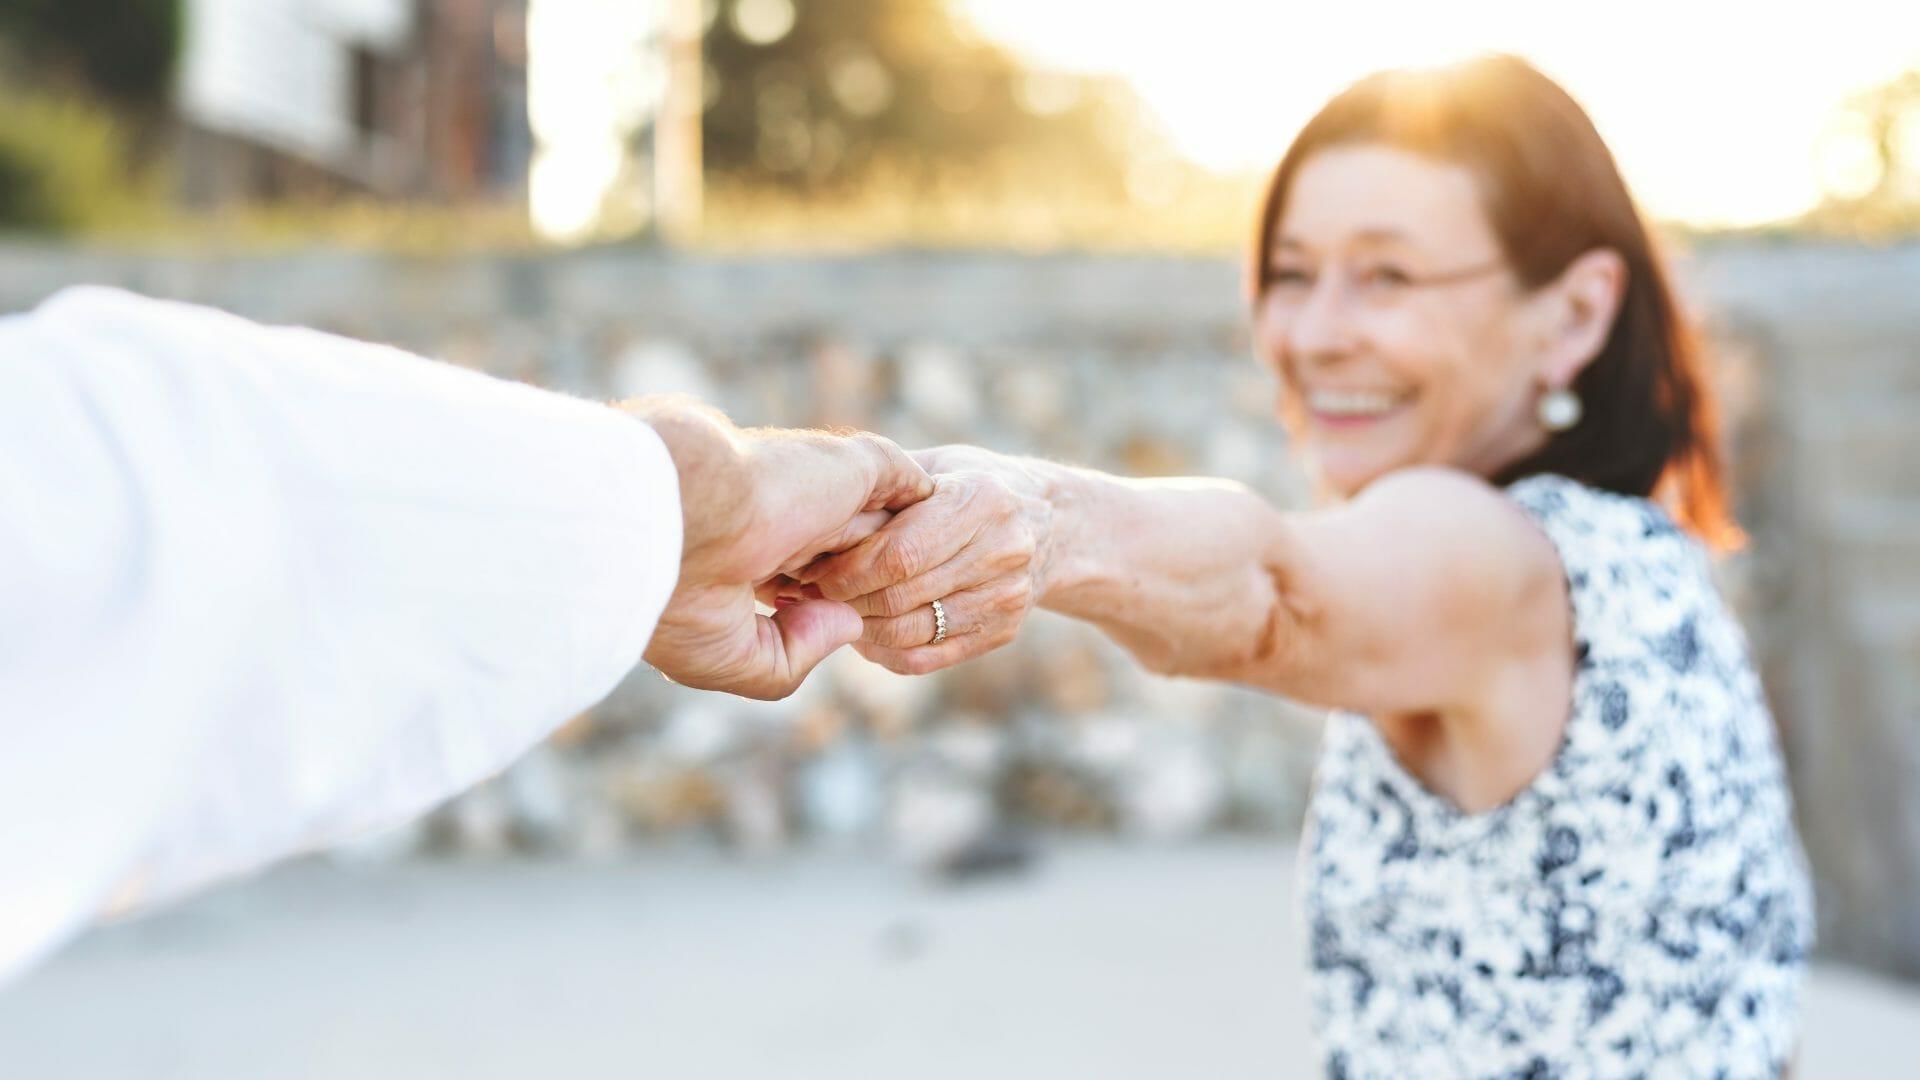 Alterndes Paar hält sich an den Händen / copyright: rawpixel